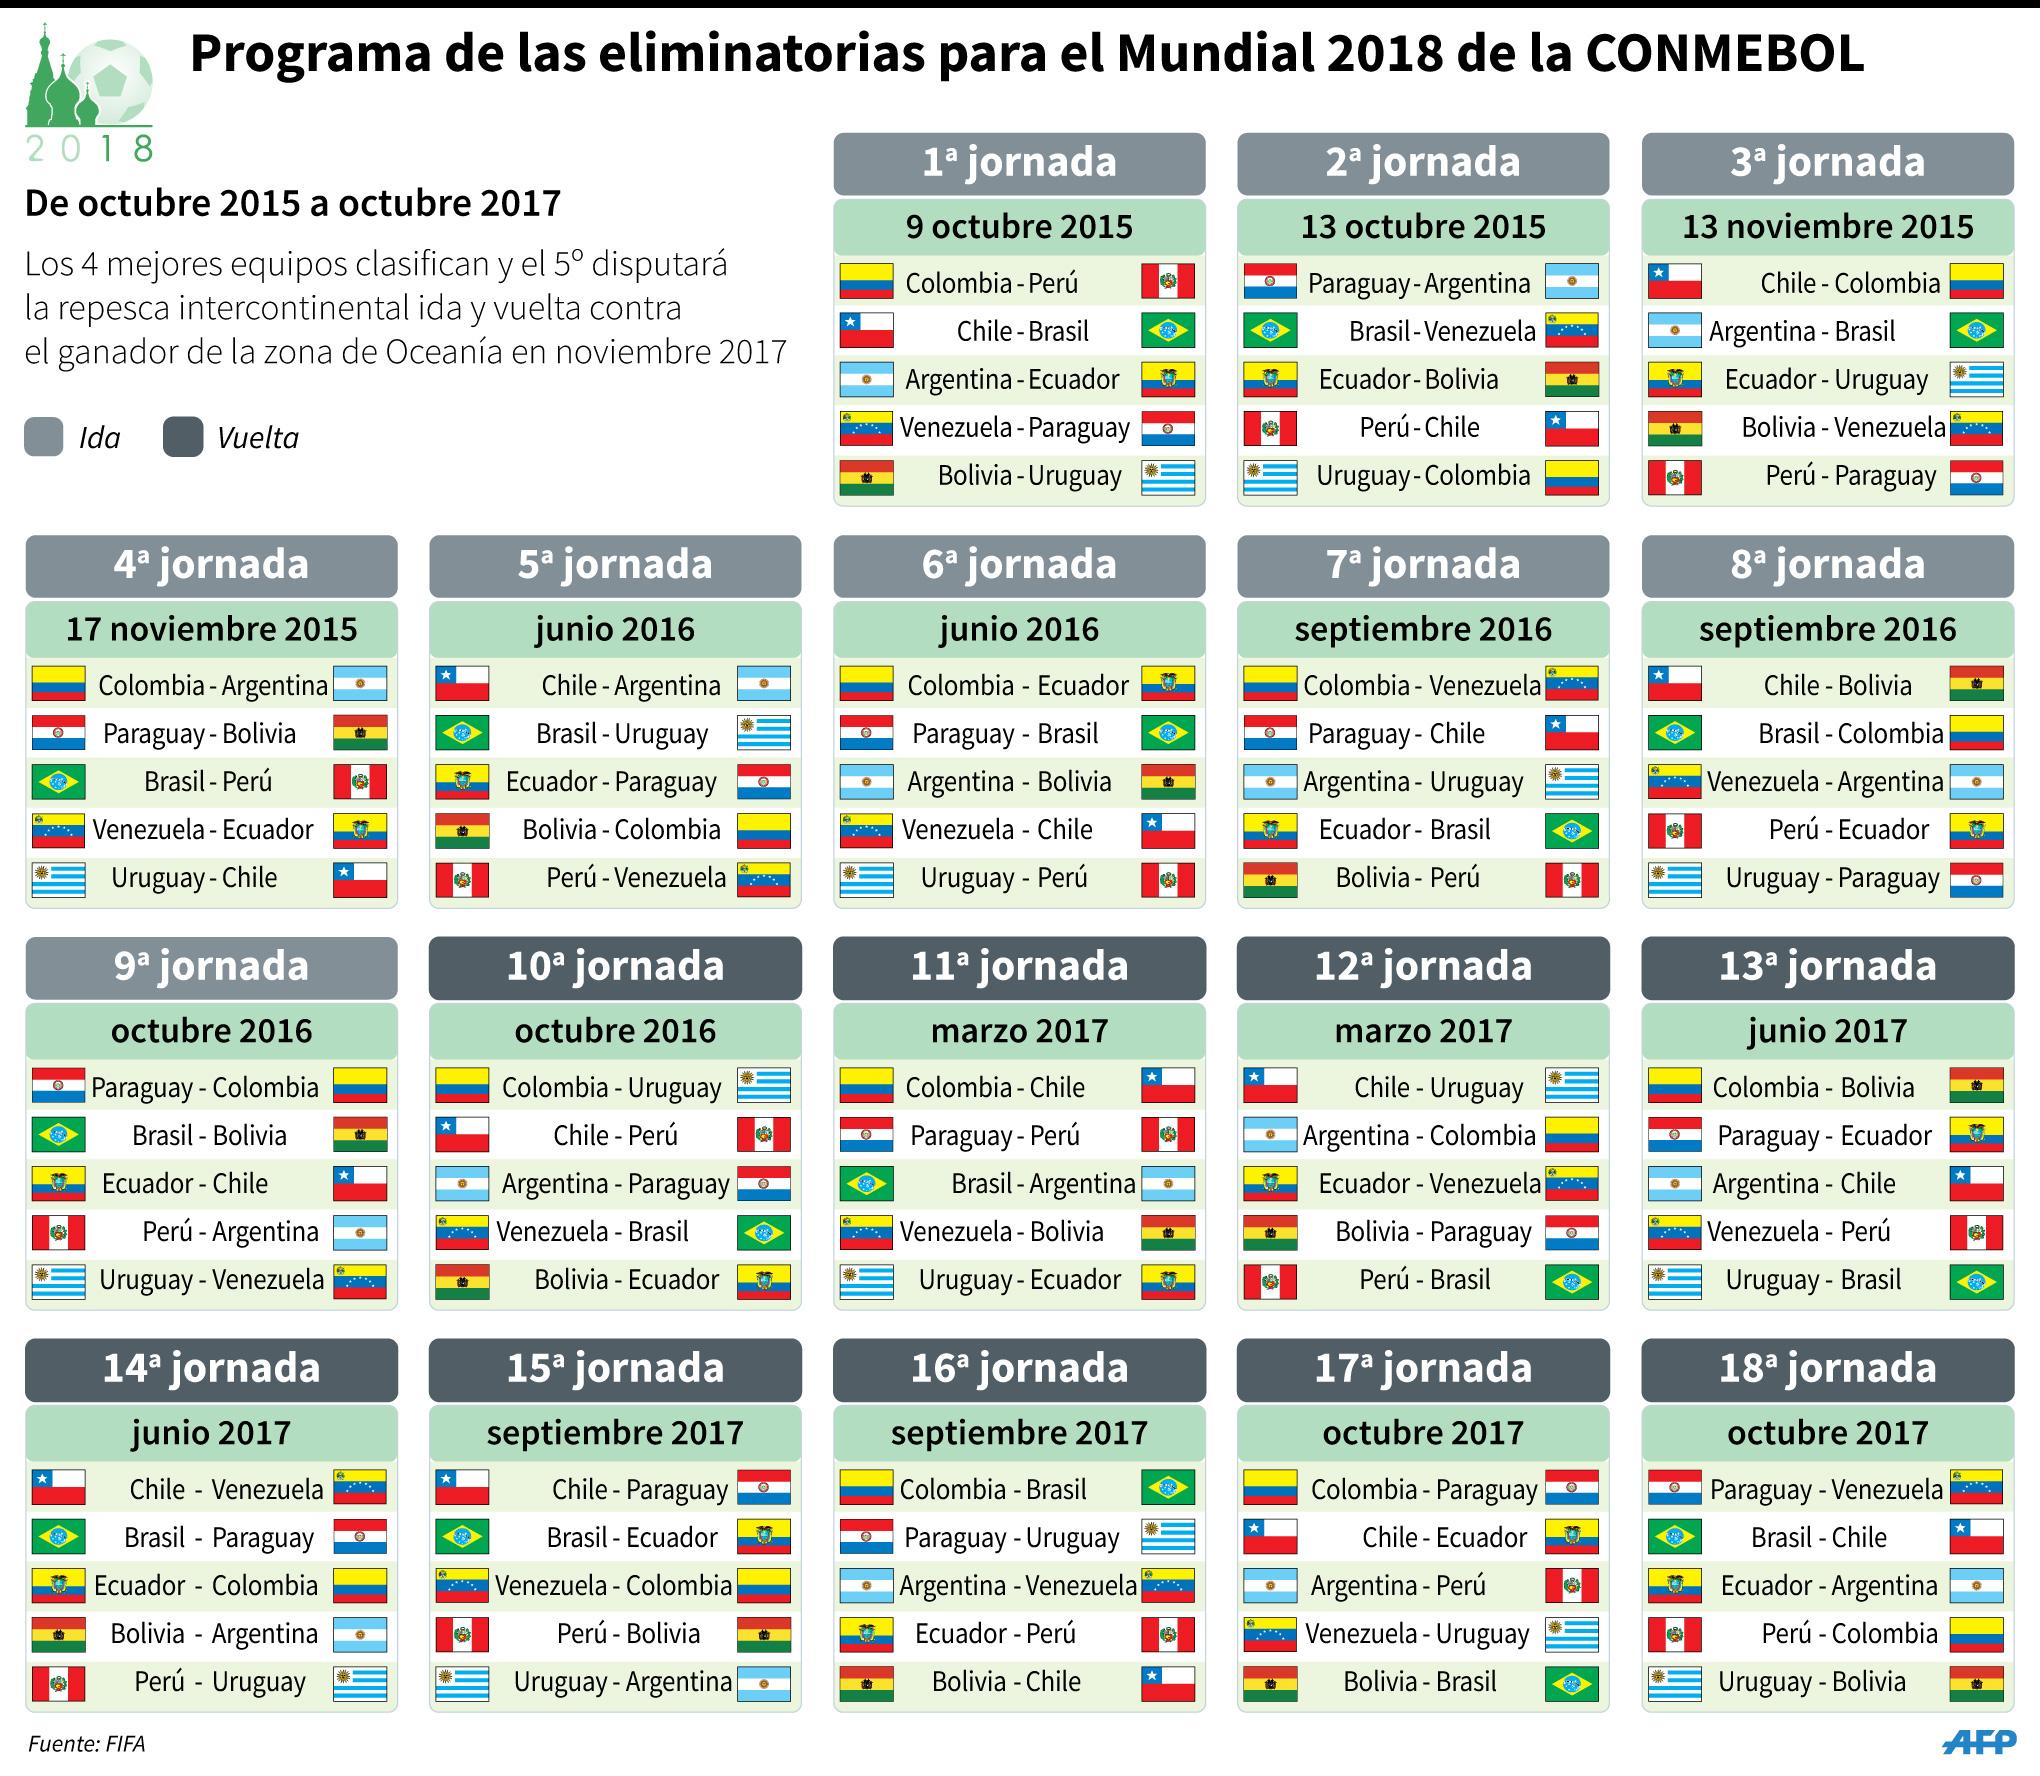 Calendario Eliminatorias Sudamericanas 2018 Wikipedia